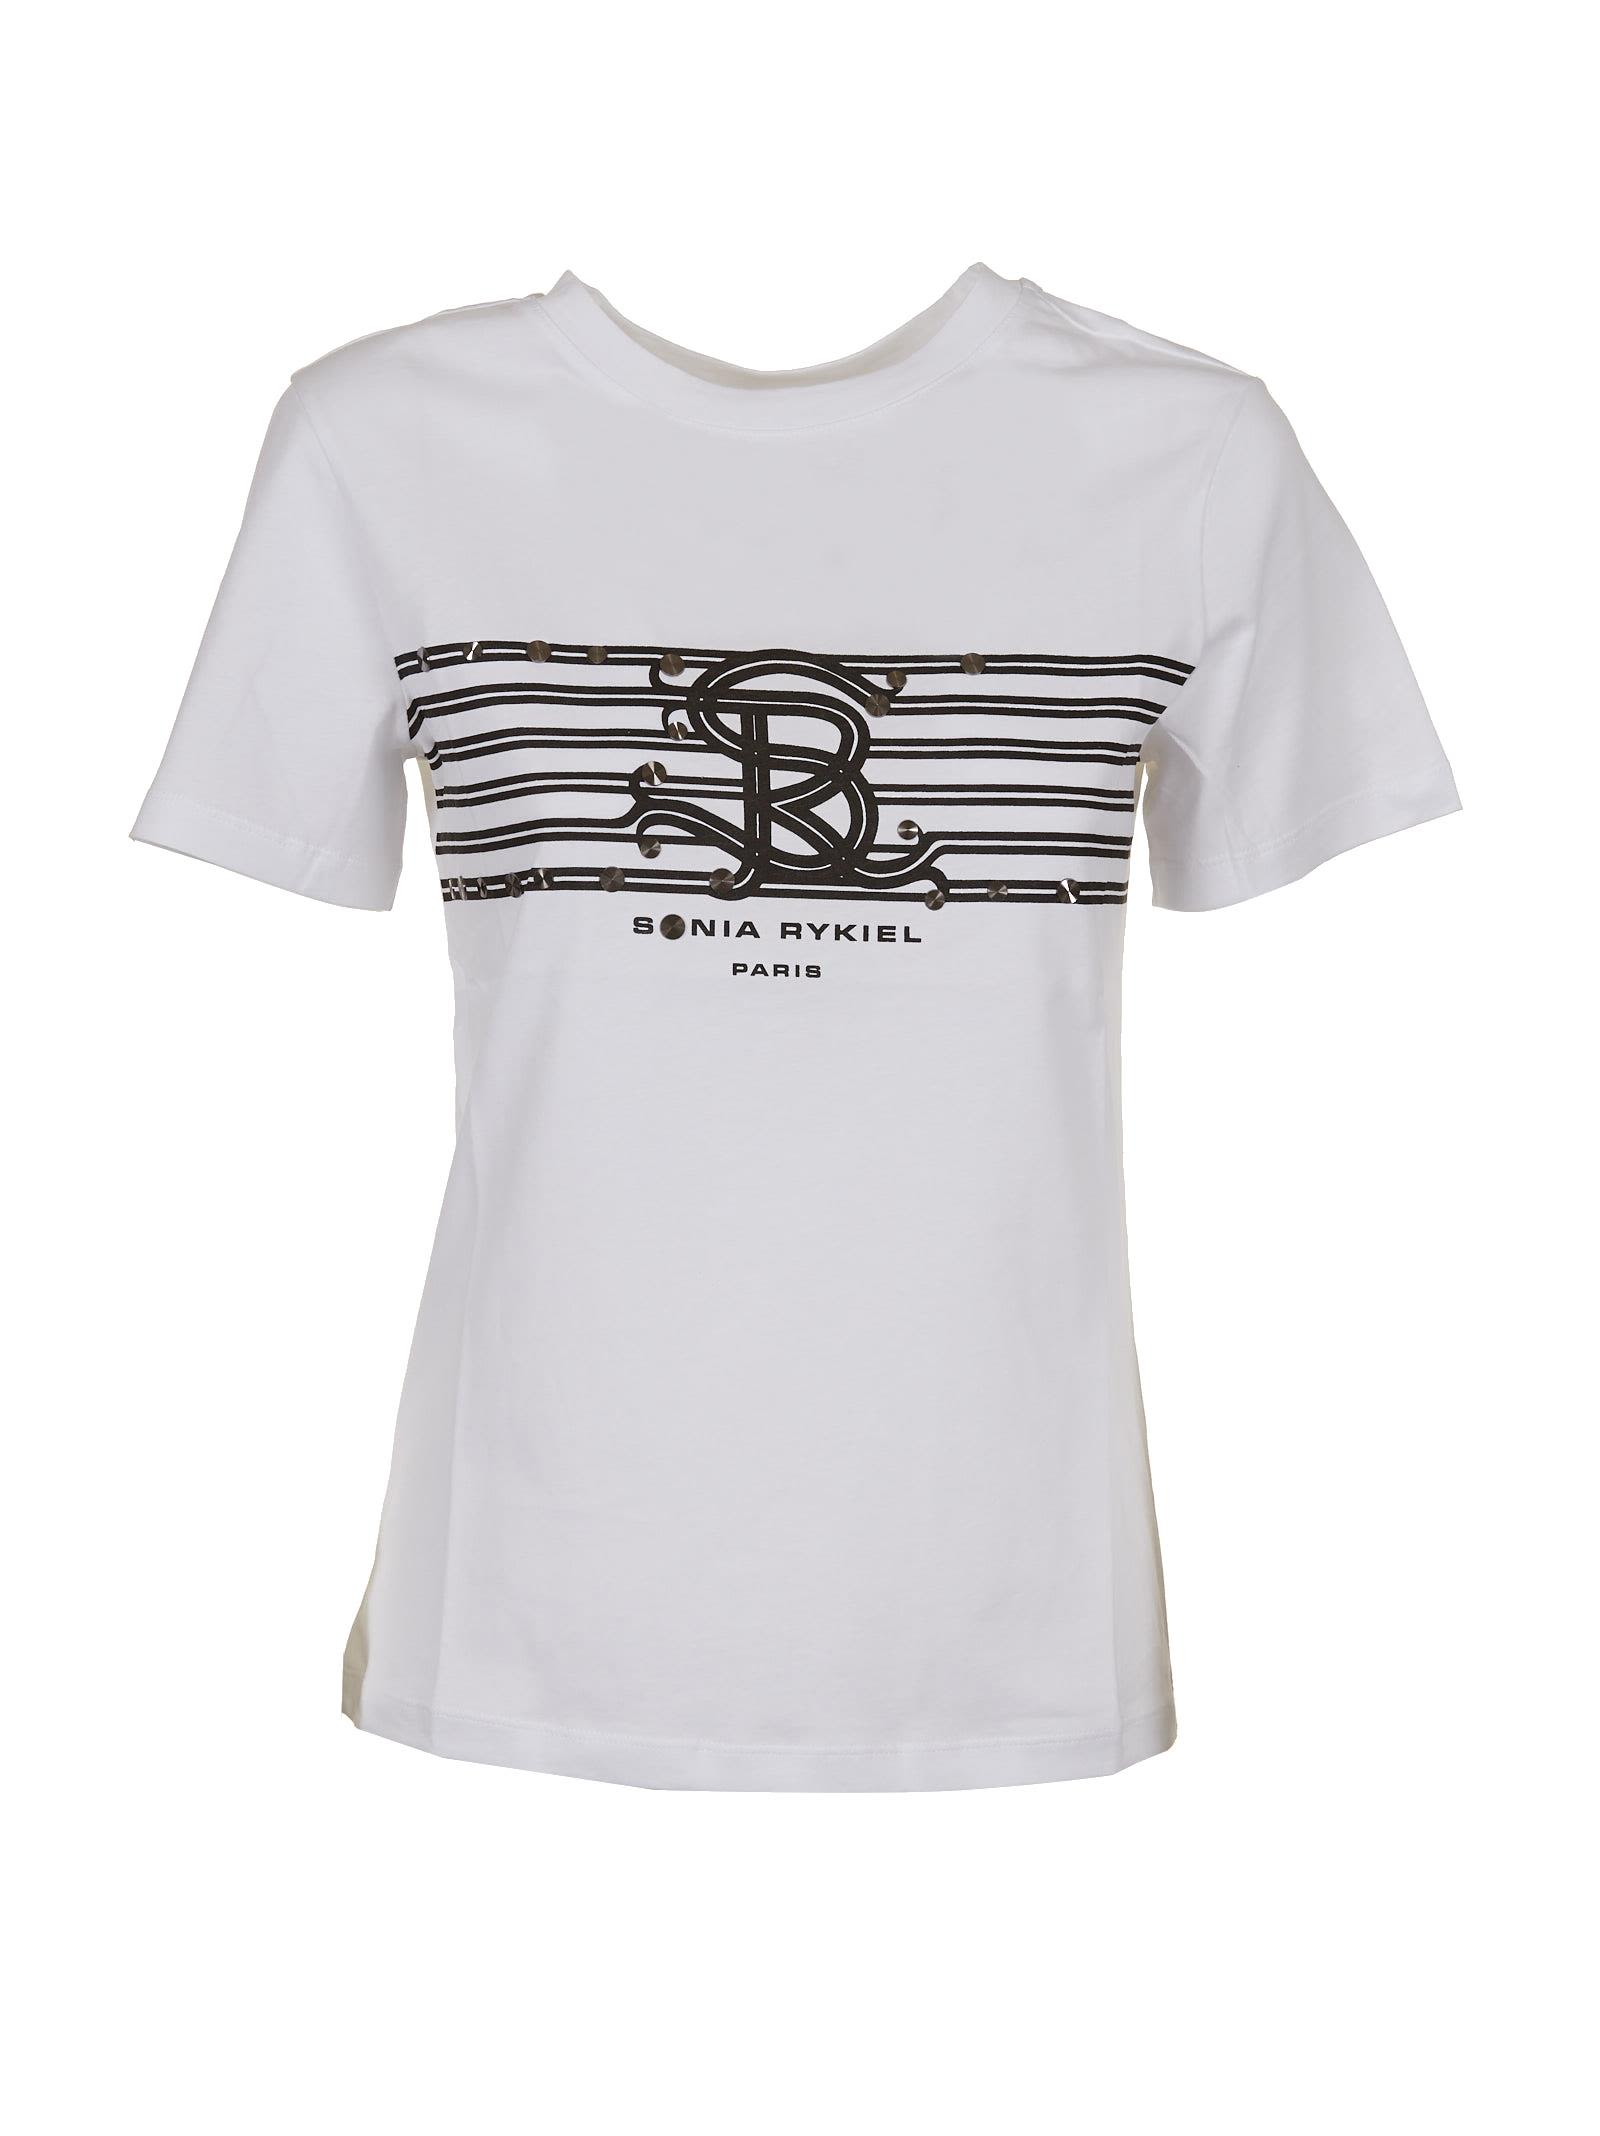 Sonia Rykiel Paris Logo Print T-shirt